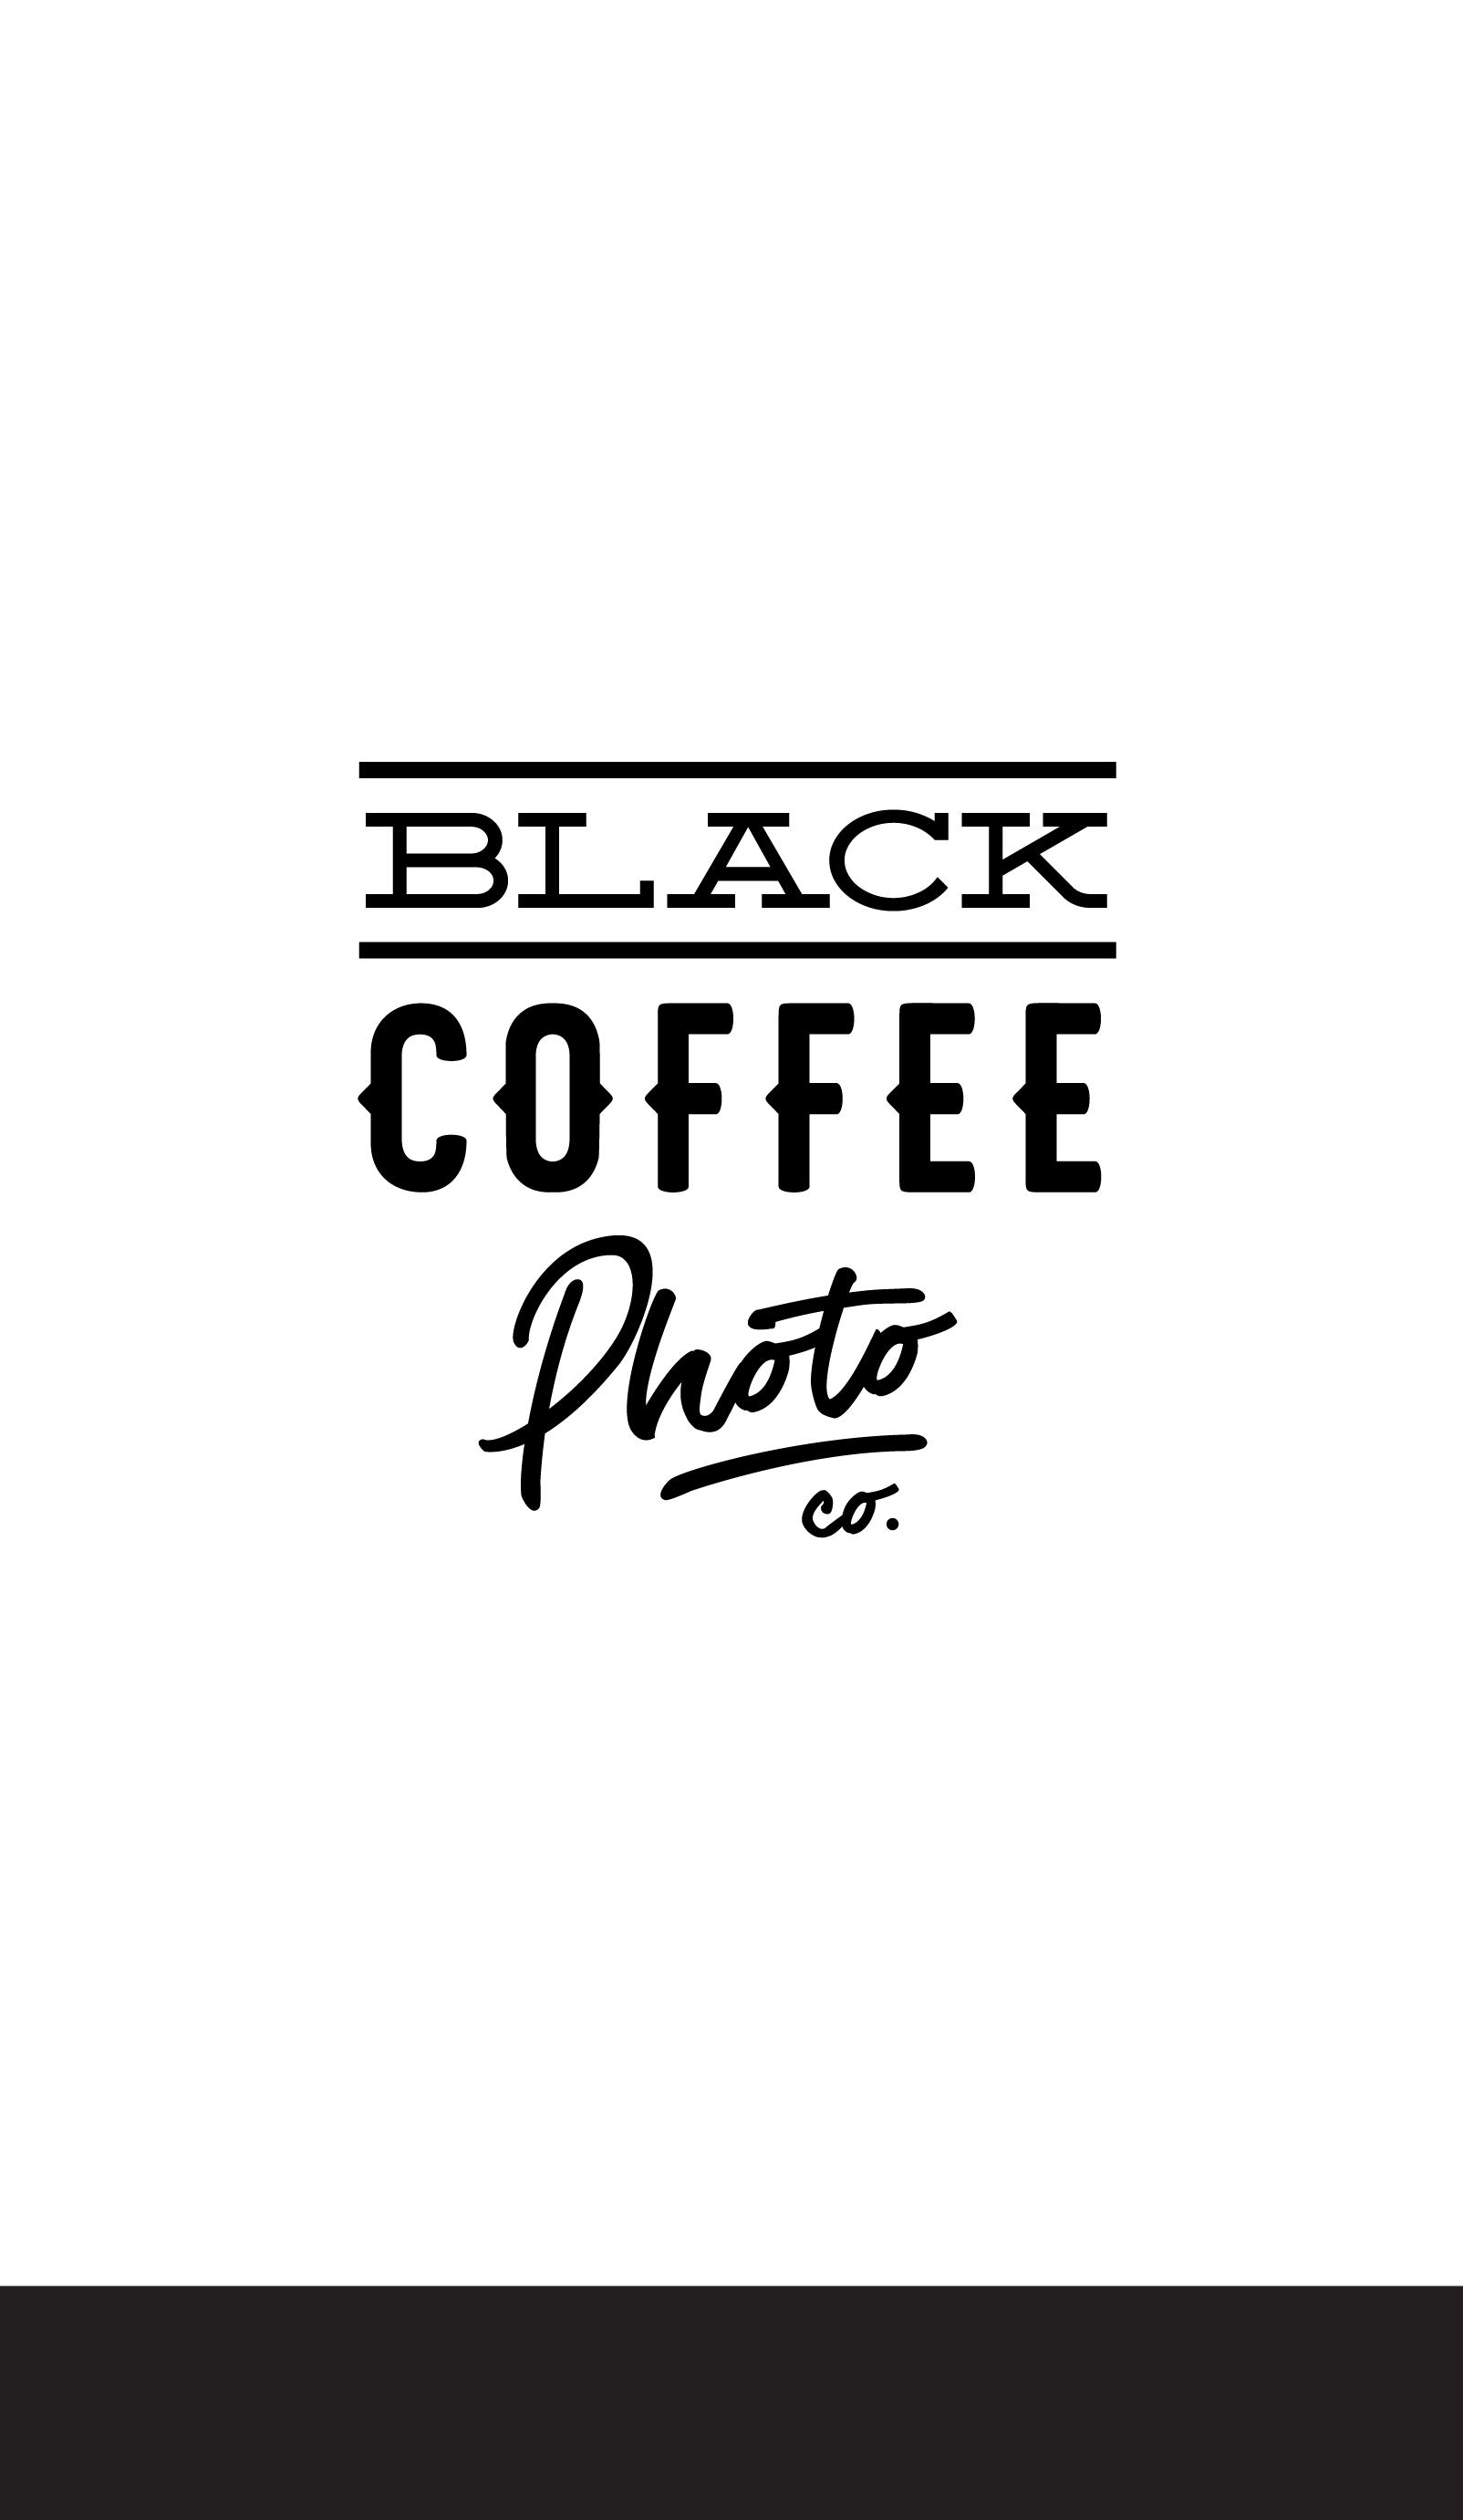 blkcoffeelaunch-04.png